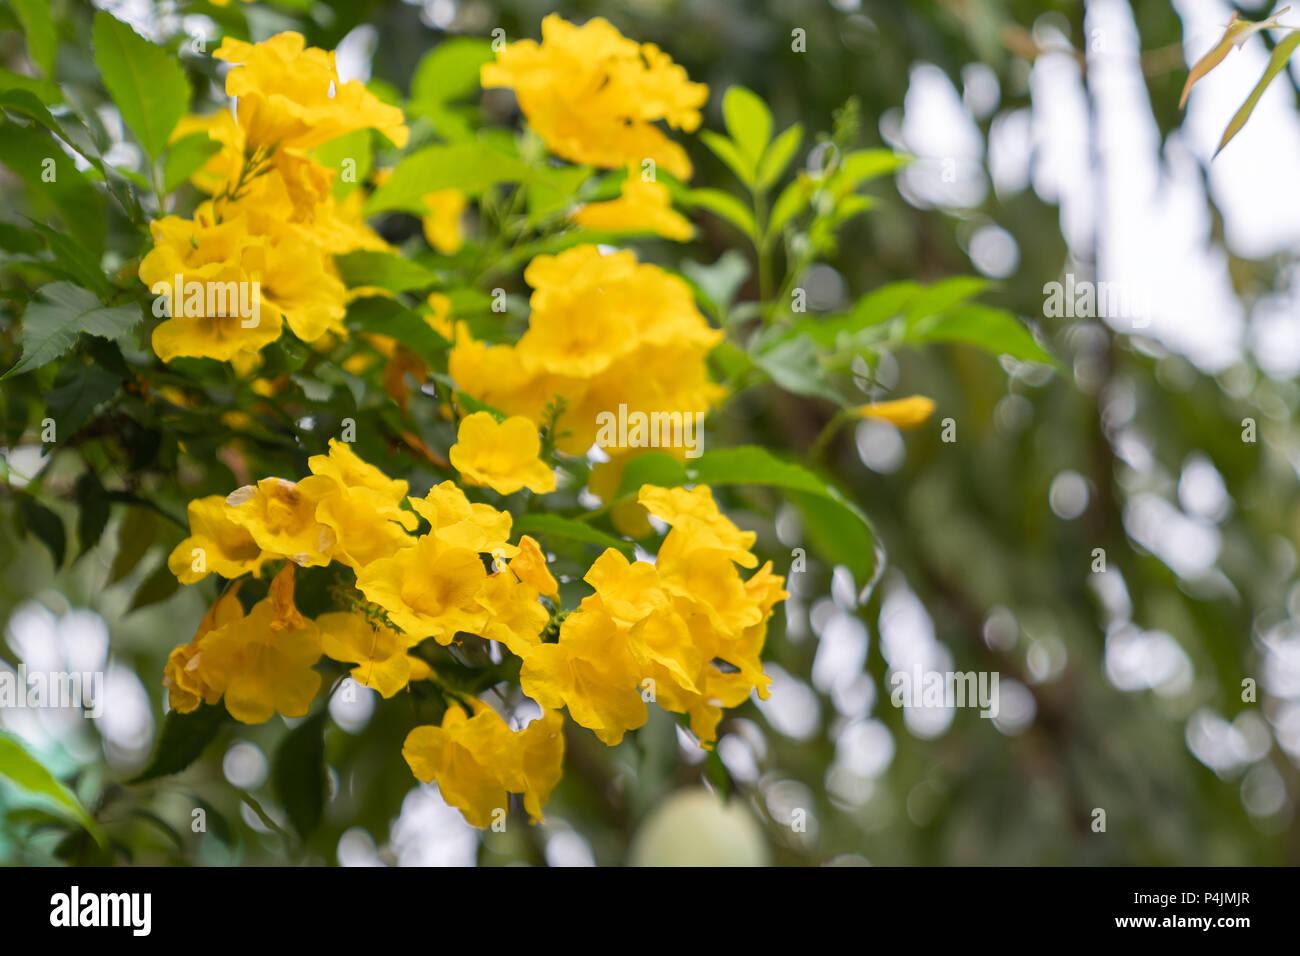 Beautiful small yellow flower on white sky background asia tree beautiful small yellow flower on white sky background asia tree background mightylinksfo